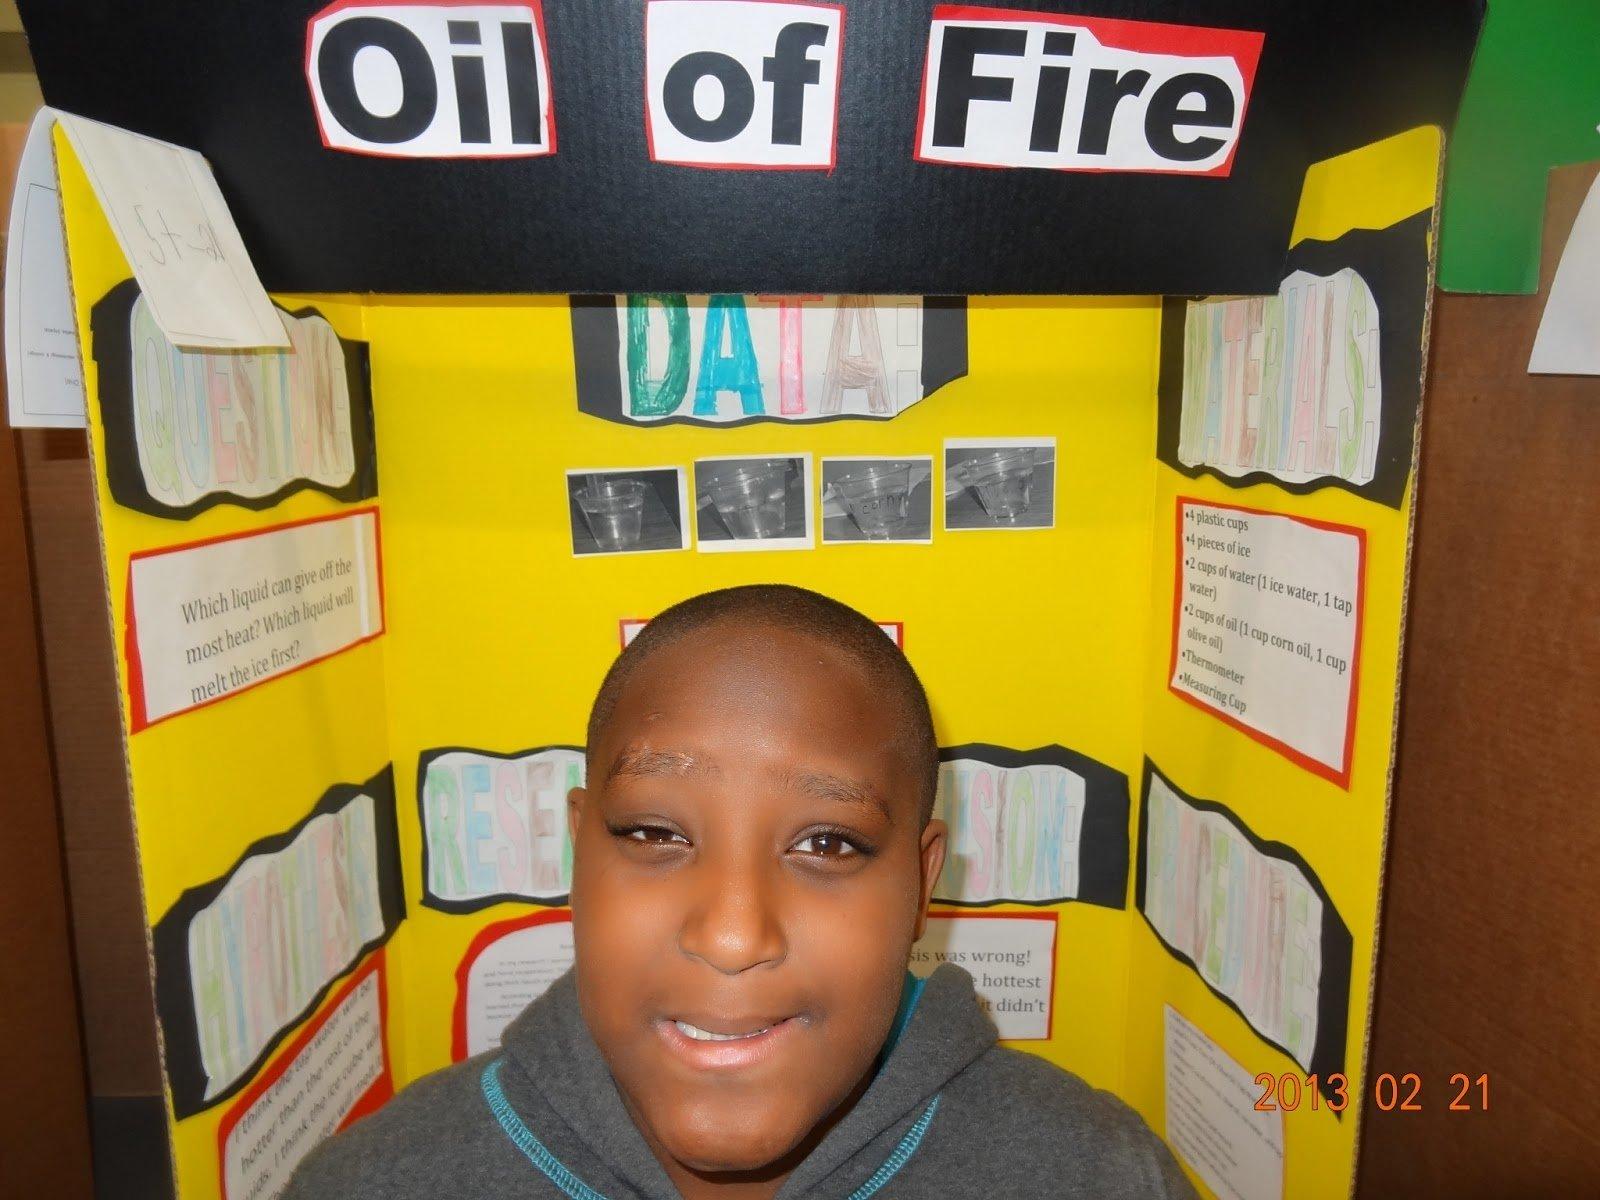 10 Beautiful Fifth Grade Science Project Ideas nokw woodwork 5th grade 8th grade science fair projects info 46 2021